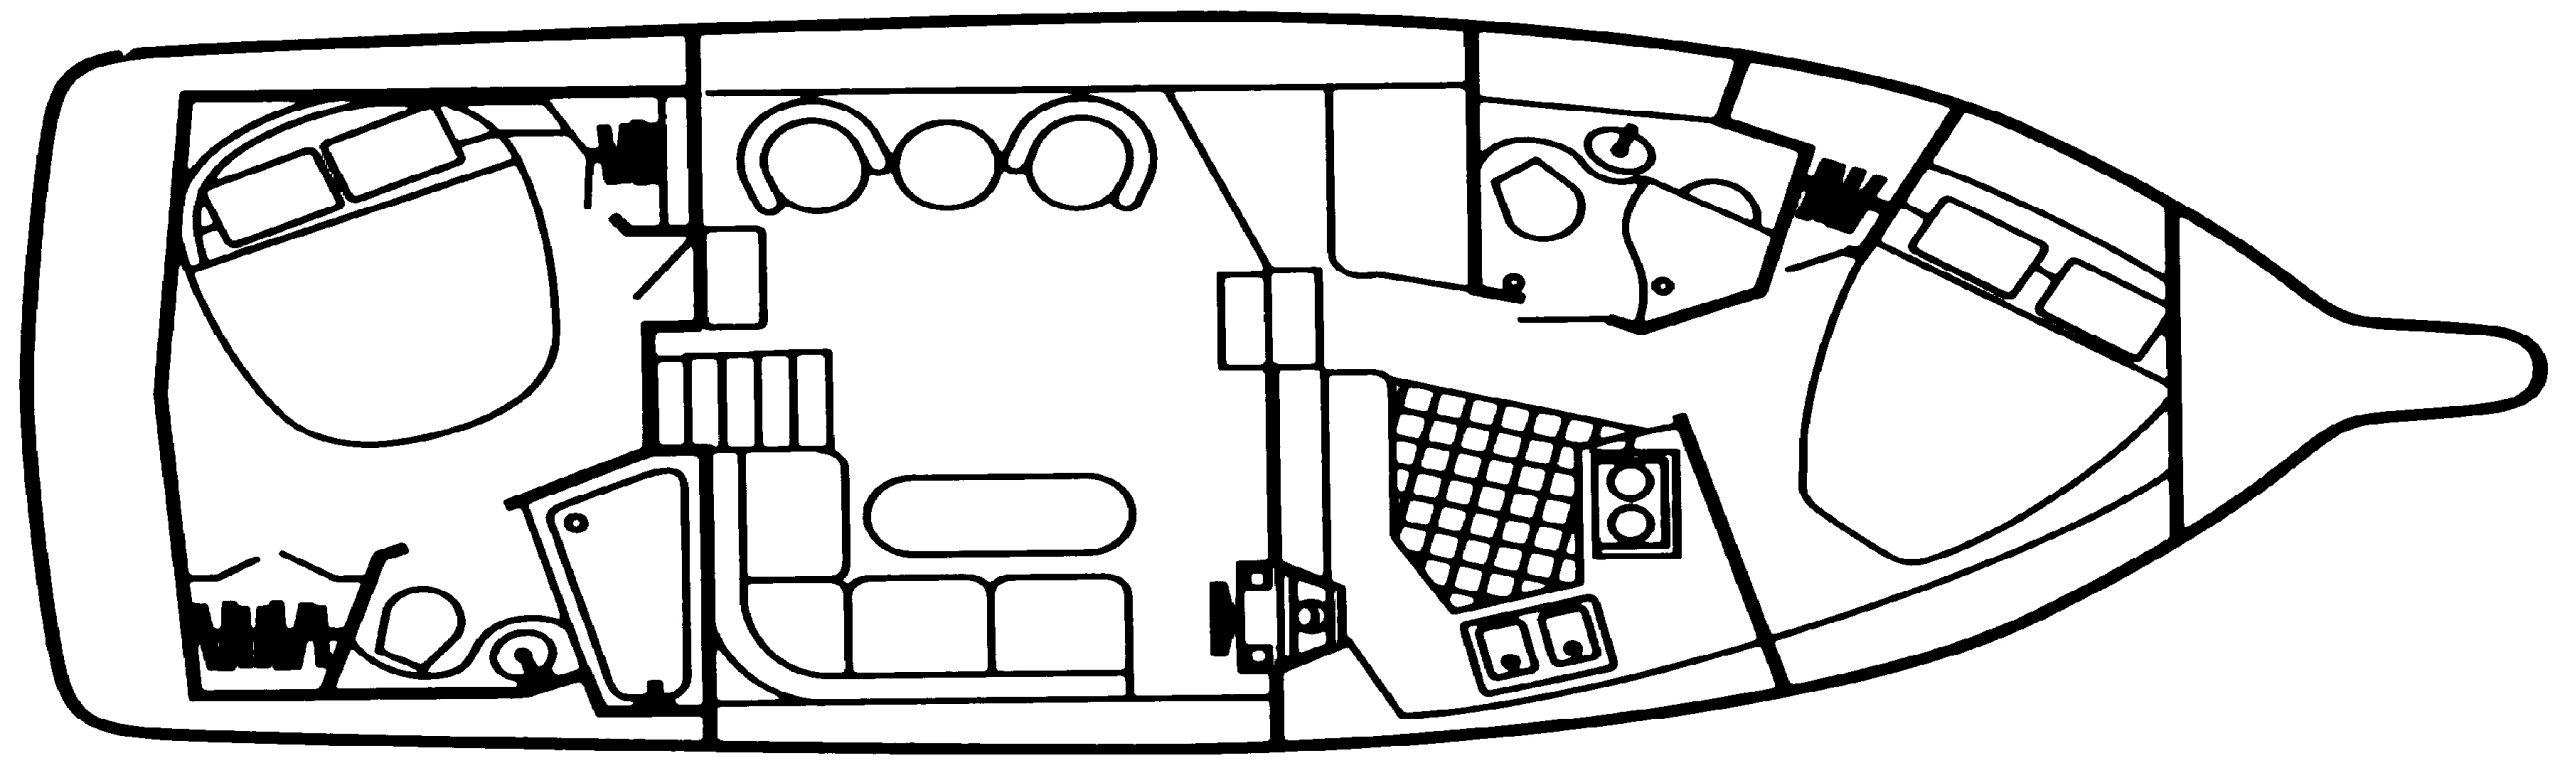 3850-3950 Aft Cabin Motor Yacht Floor Plan 2